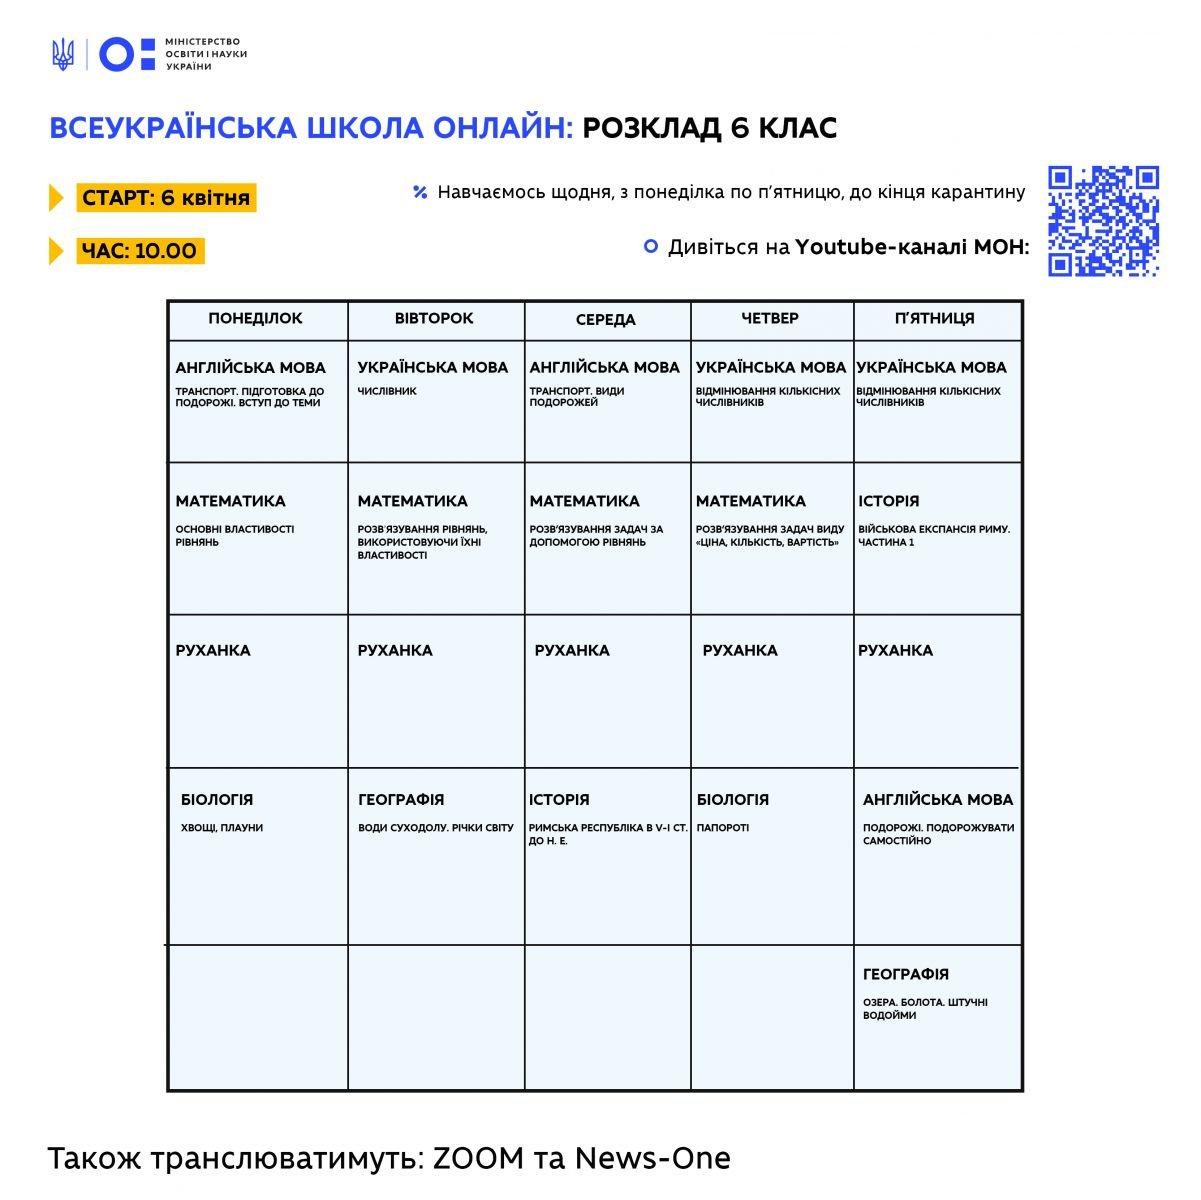 "Расписание уроков онлайн 6 класс: ""Всеукраинская школа онлайн"" / Фото: МОН"